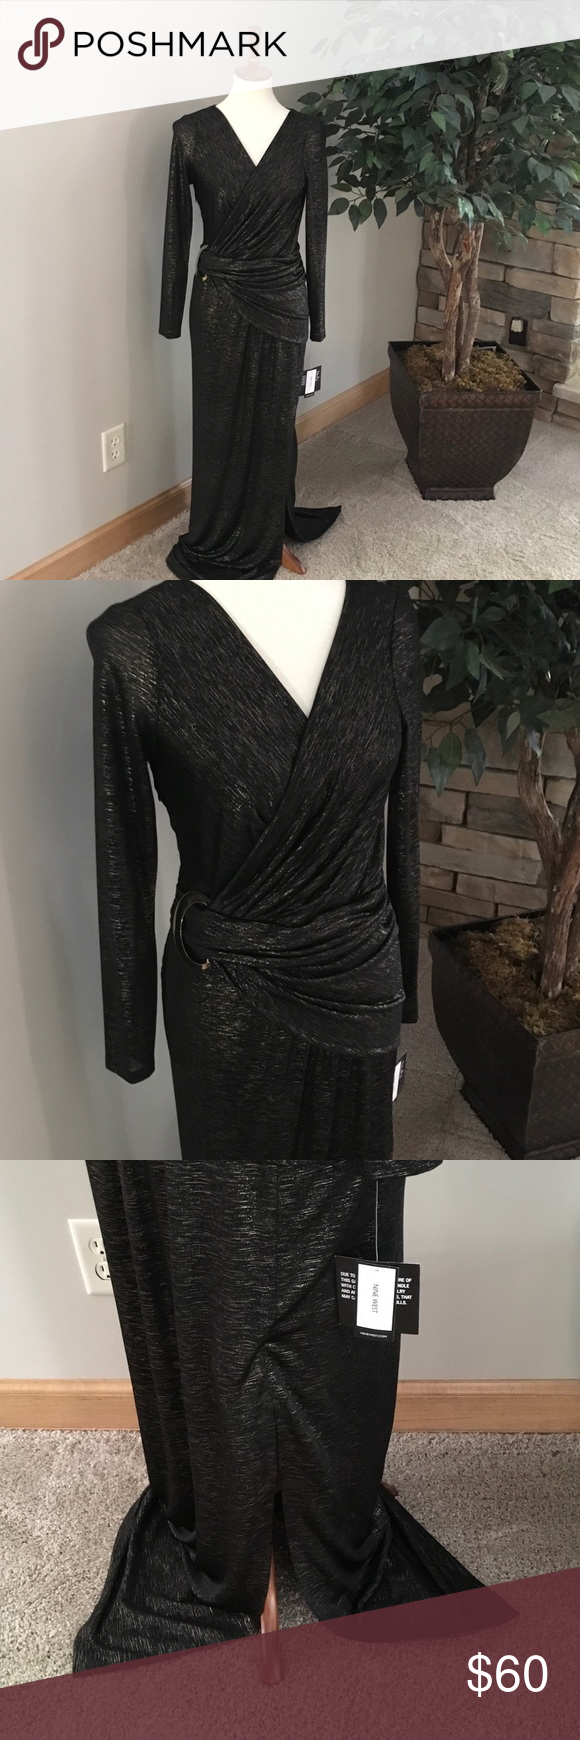 Nine west maxi evening dress stunning black evening dress with a